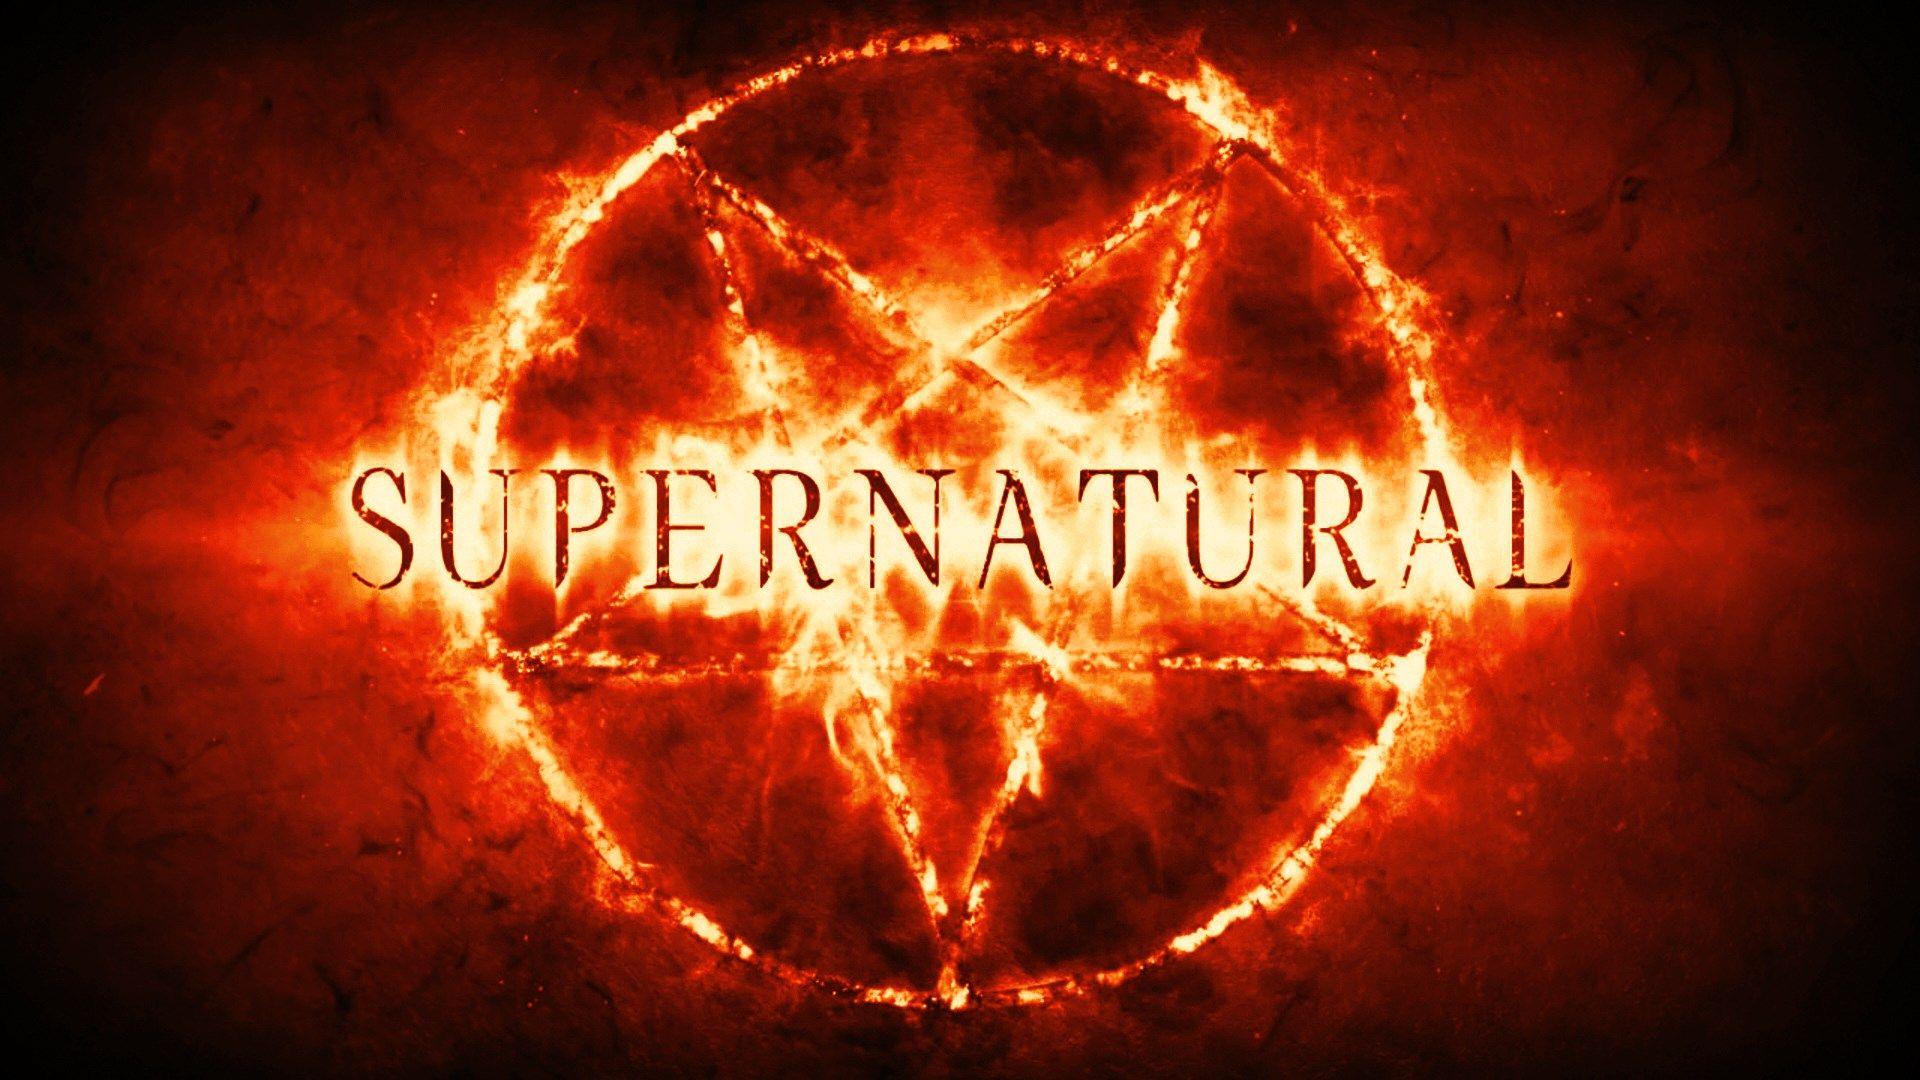 supernatural background wallpaper hd Supernatural